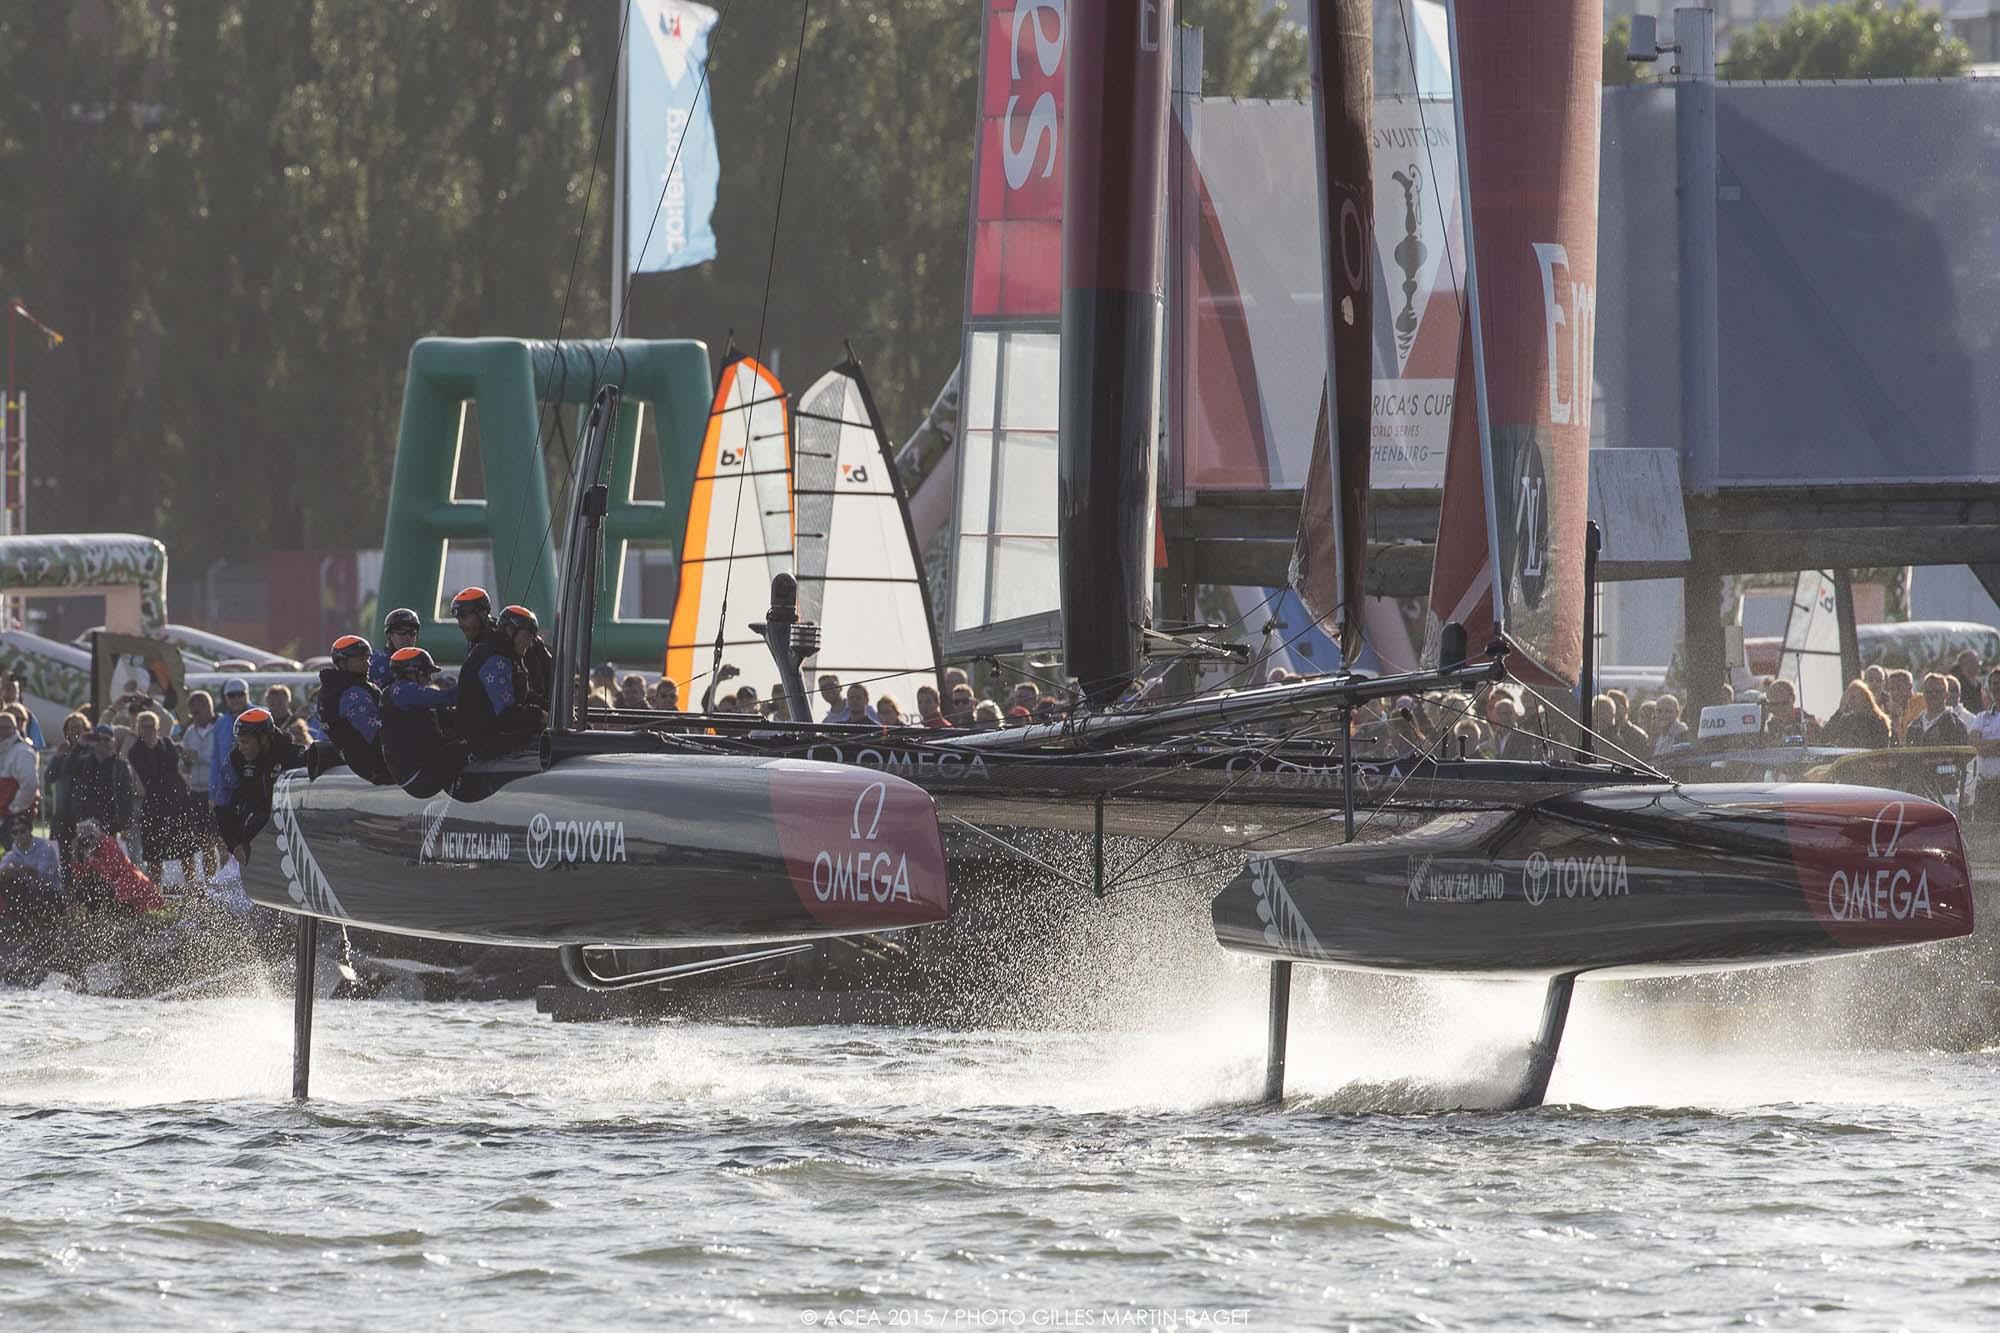 racing_bankappsegling_2015_Americas_Cup_Sverige_Bildspel_G15LVACWSD4_2205